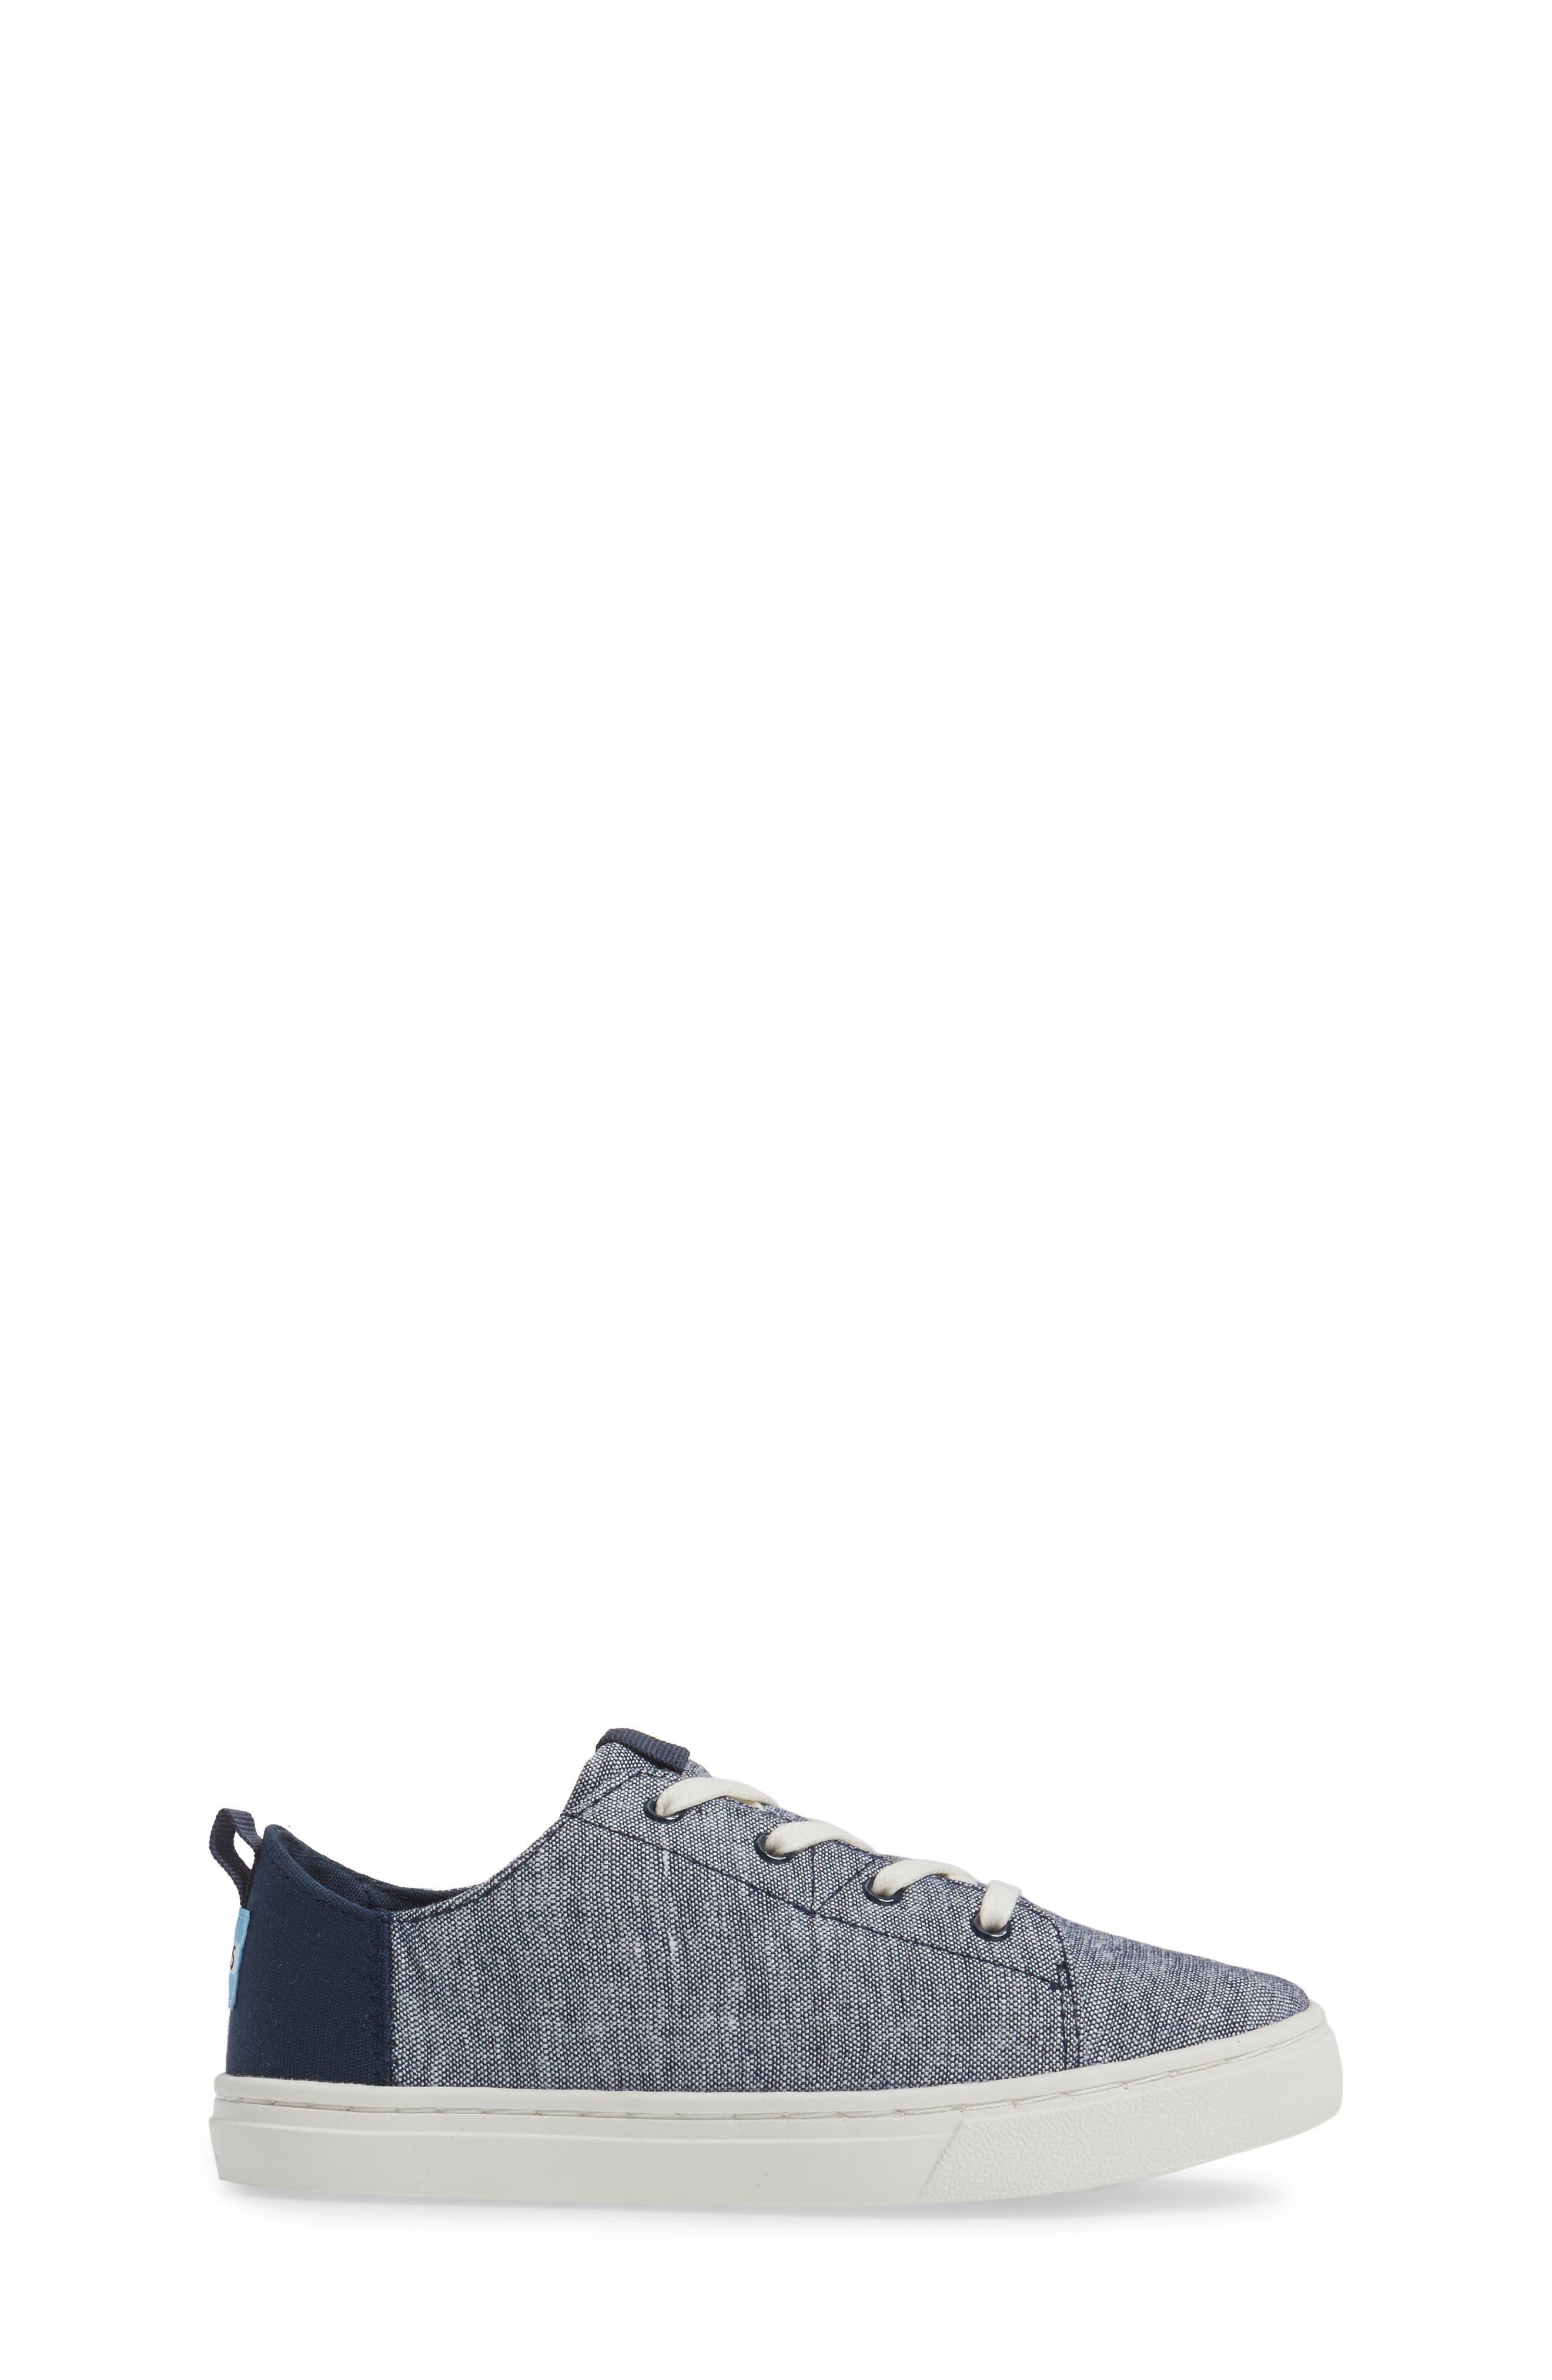 Lenny Sneaker,                             Alternate thumbnail 3, color,                             NAVY CHAMBRAY